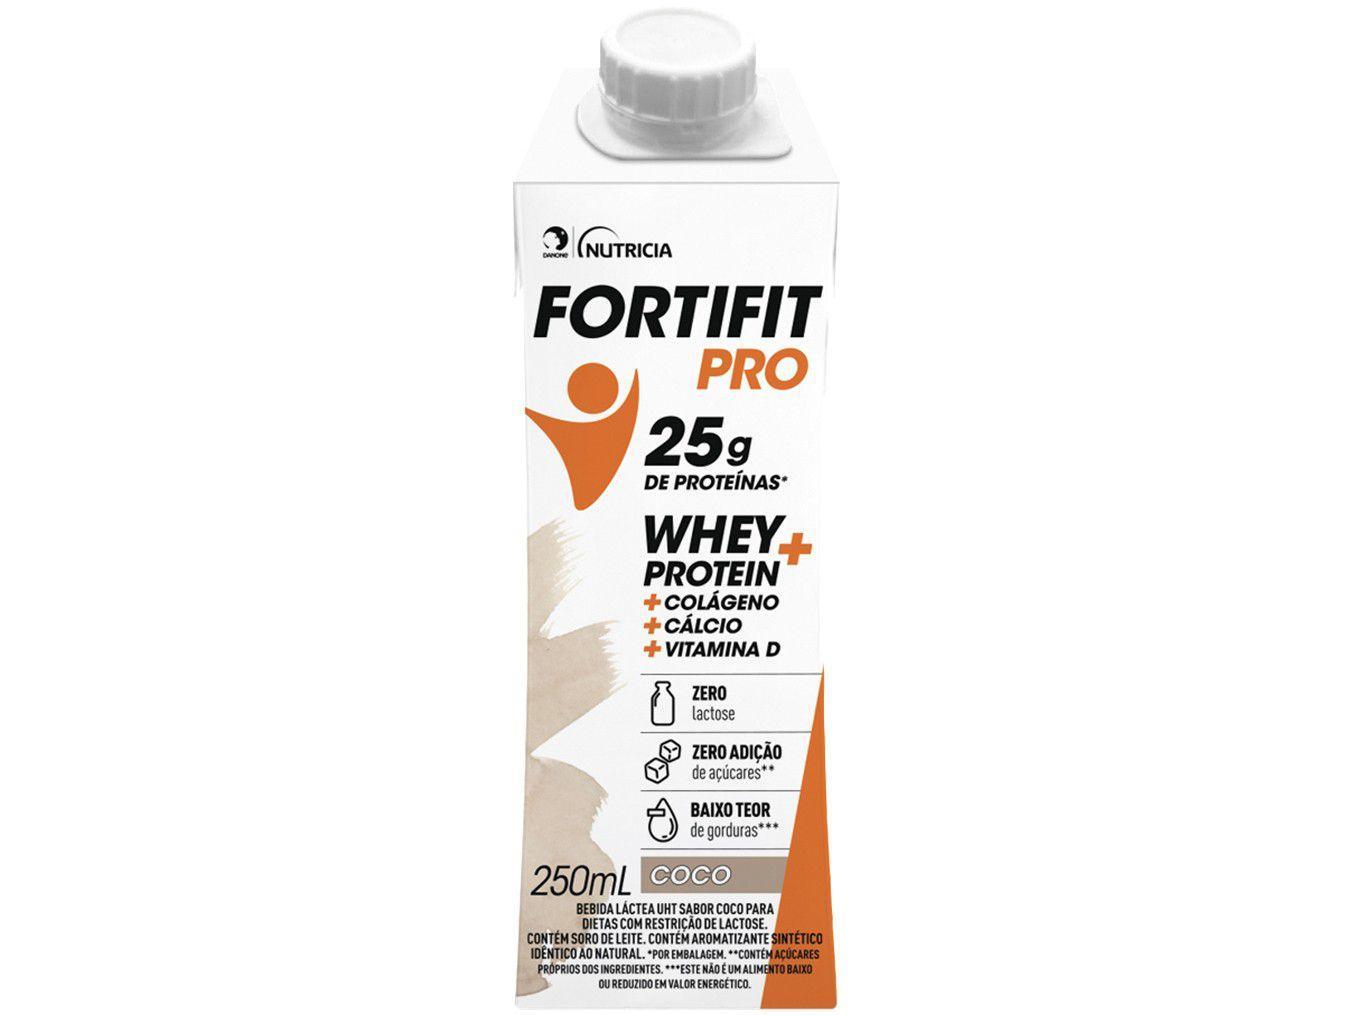 Bebida Láctea Fortifit Pro Coco Zero Açúcar - 250ml